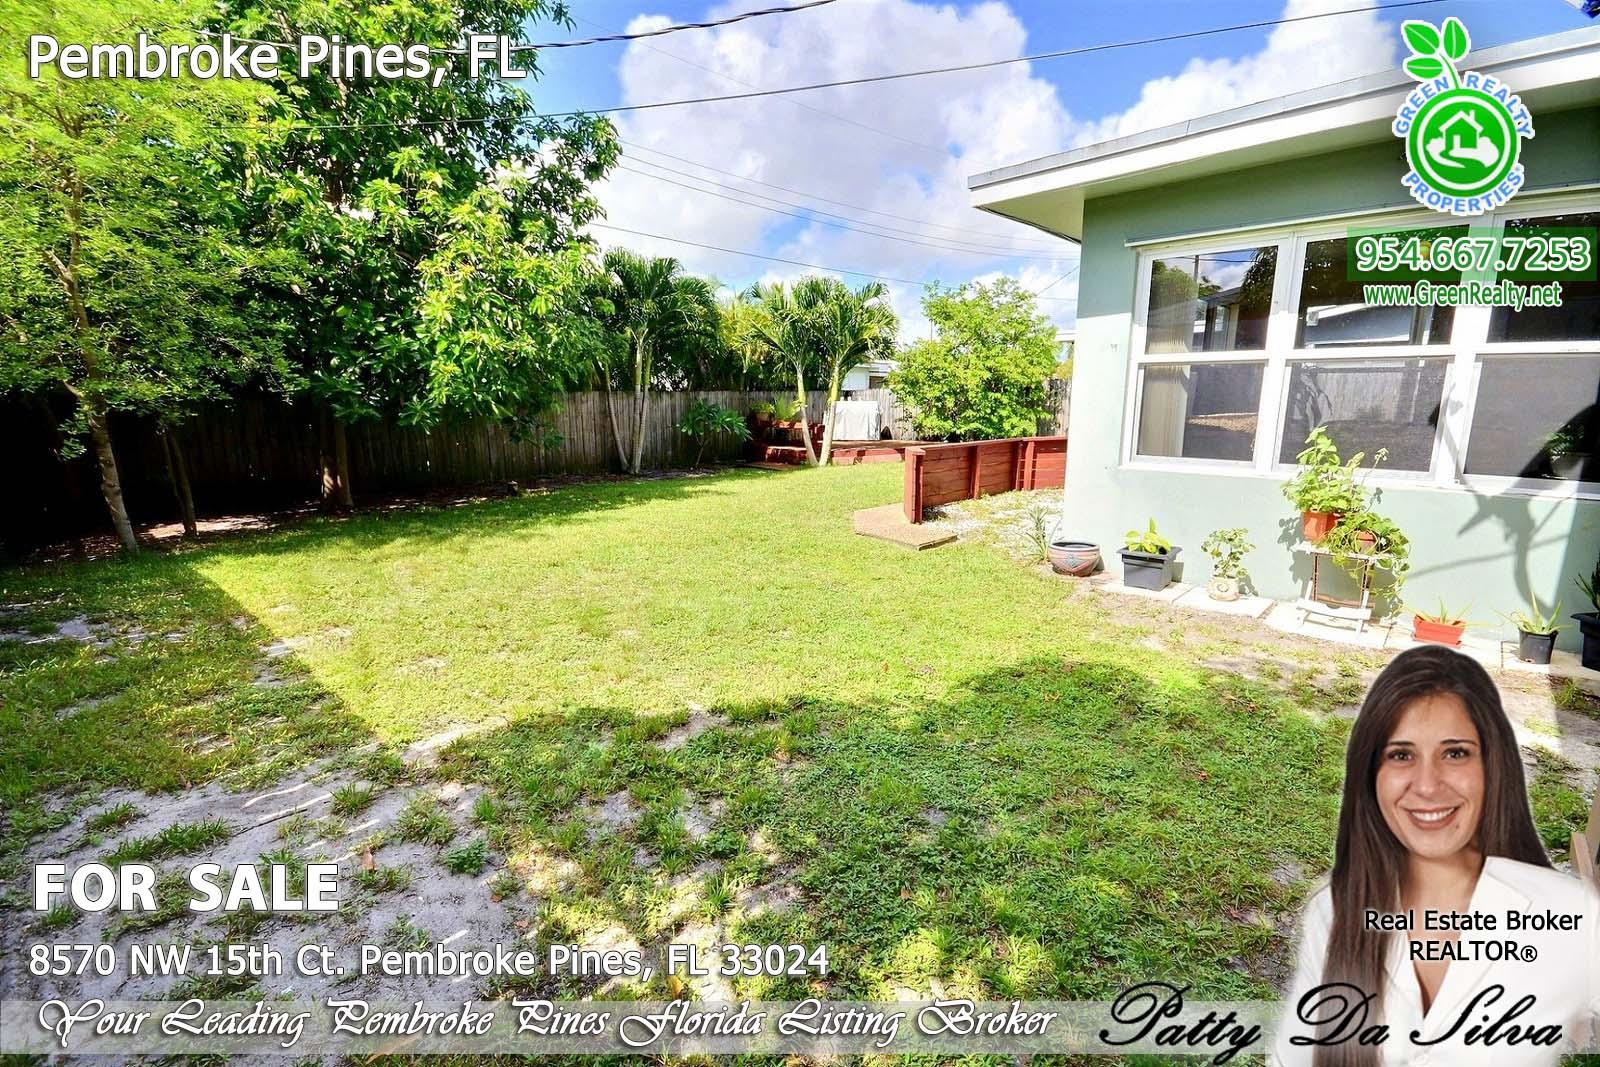 Pembroke Pines Homes For Sale - Best REALTORS (4)